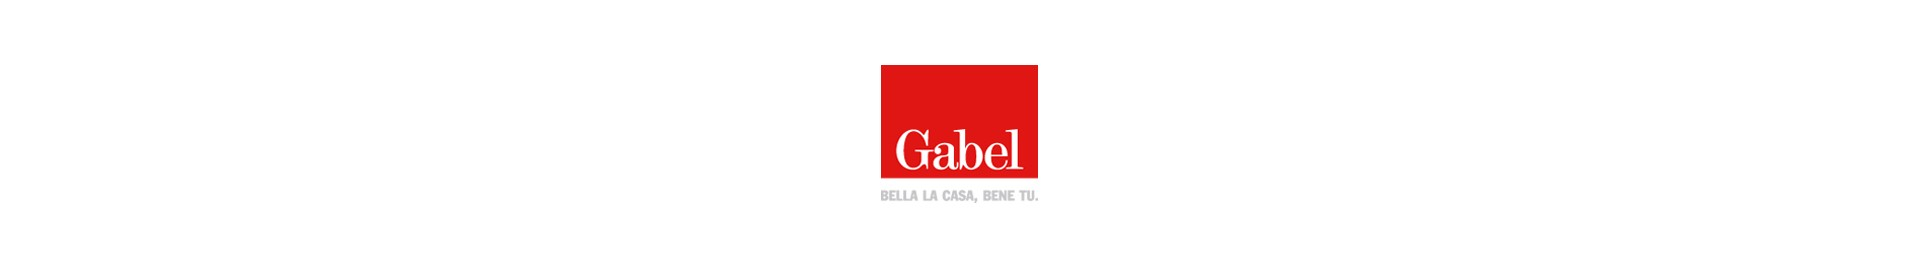 GABEL - Rasoline L.F.D. Home